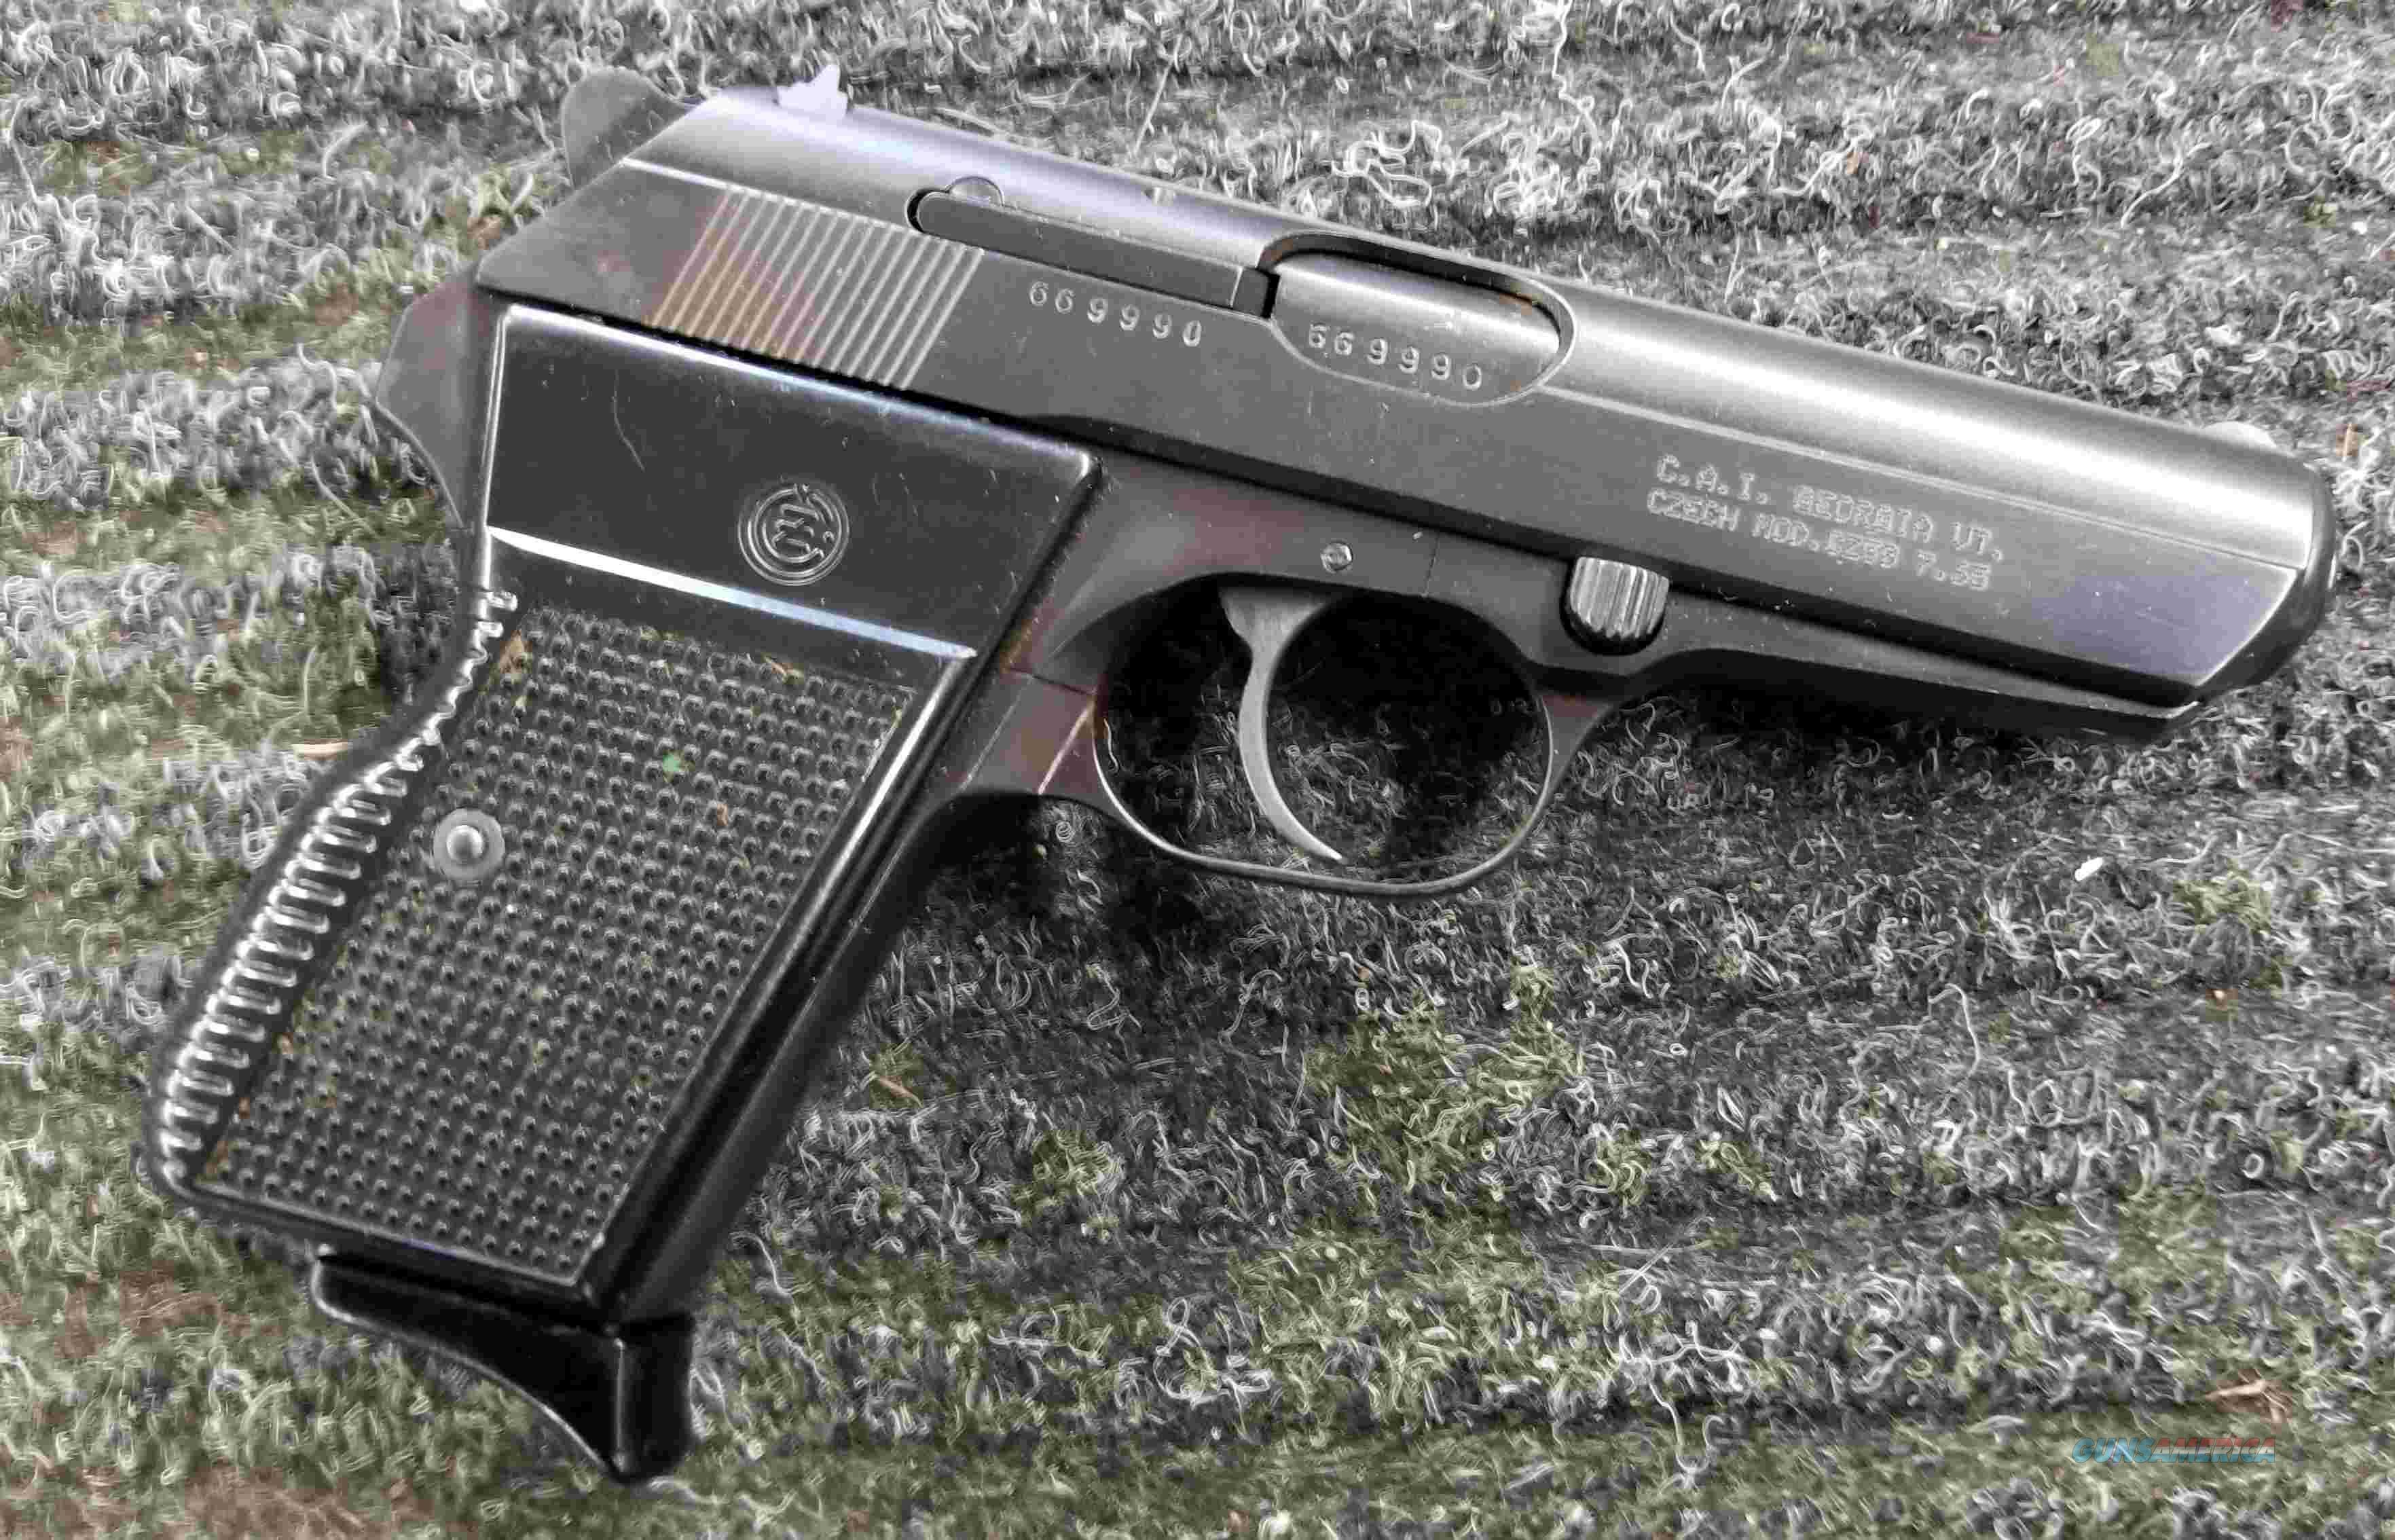 CZ 50 - 32ACP - 3 Mags - Free Shipping !!  Guns > Pistols > CZ Pistols